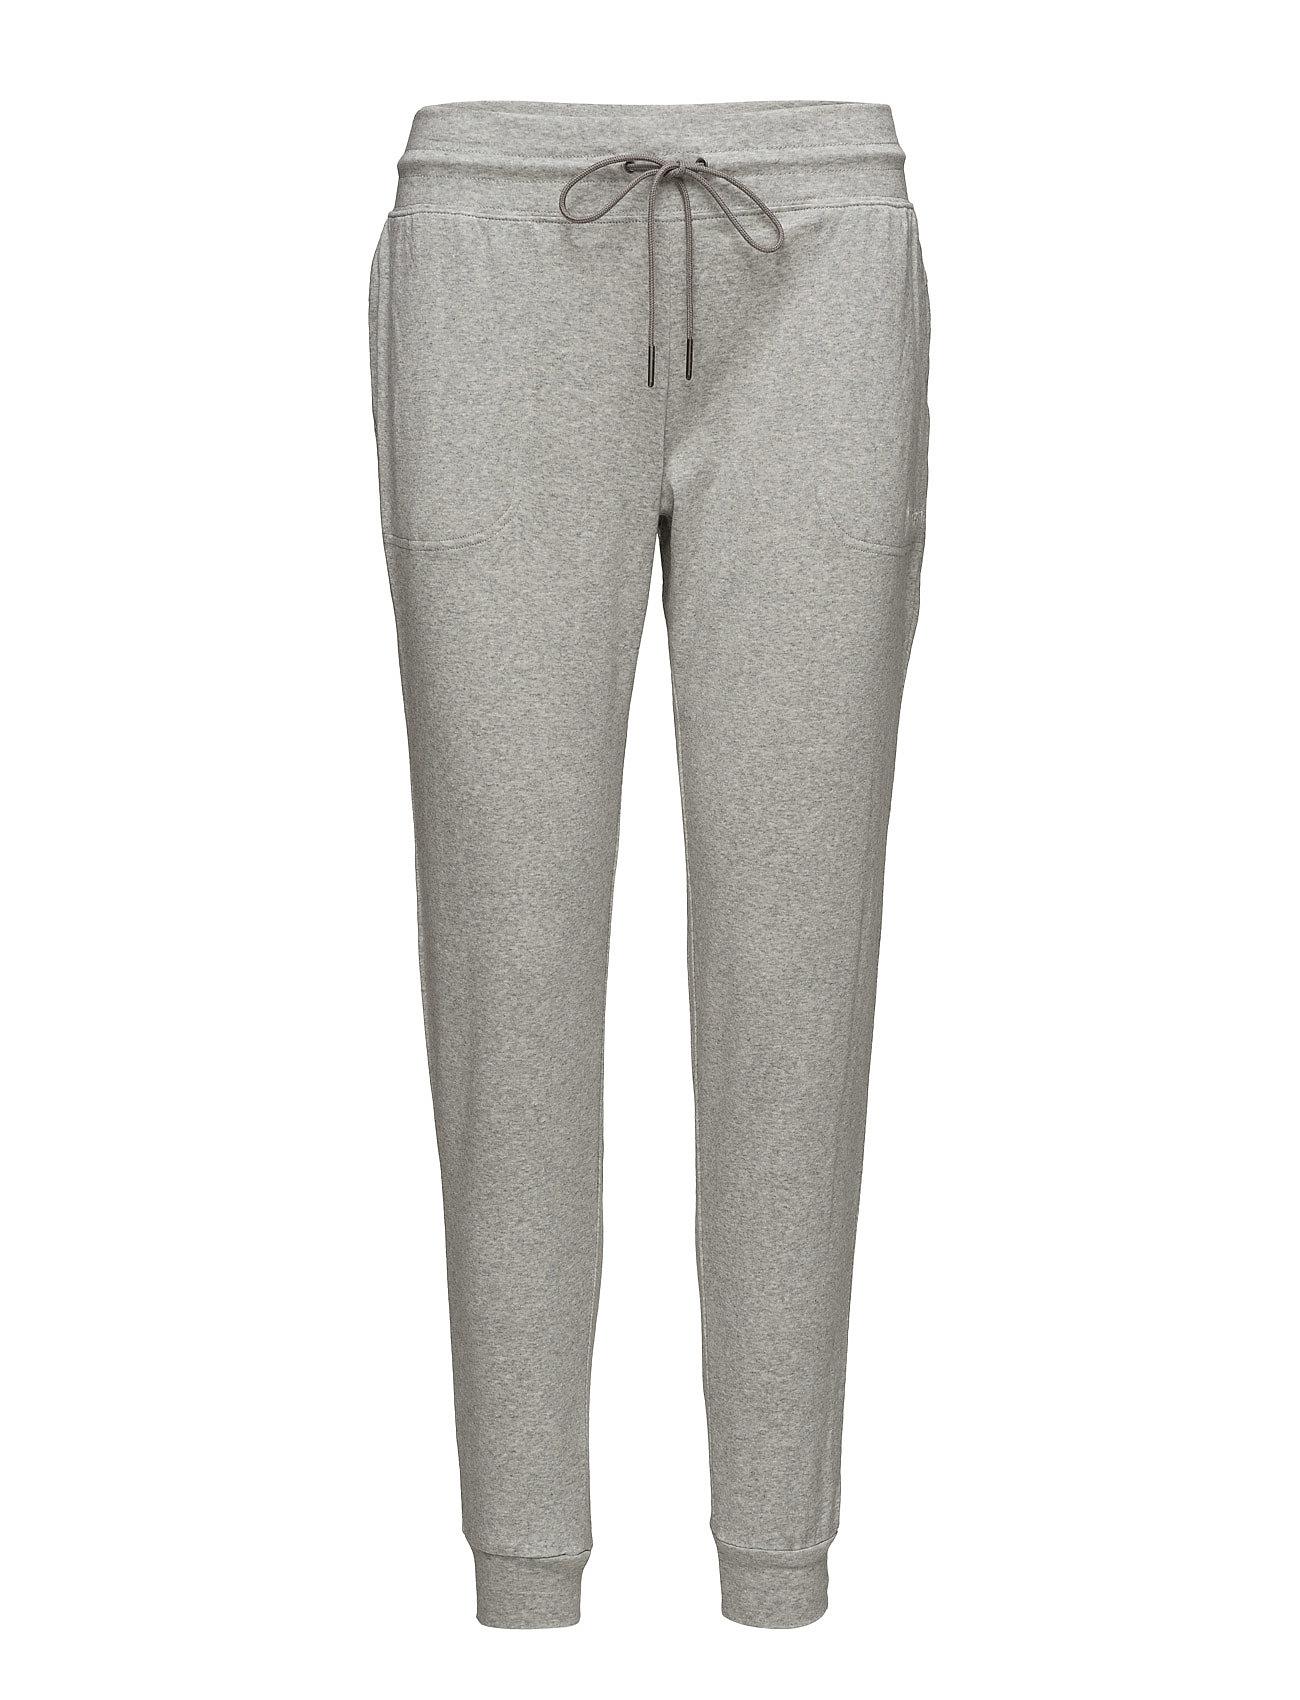 Jogger, 001, Xs Calvin Klein Loungewear til Damer i Grey Heather